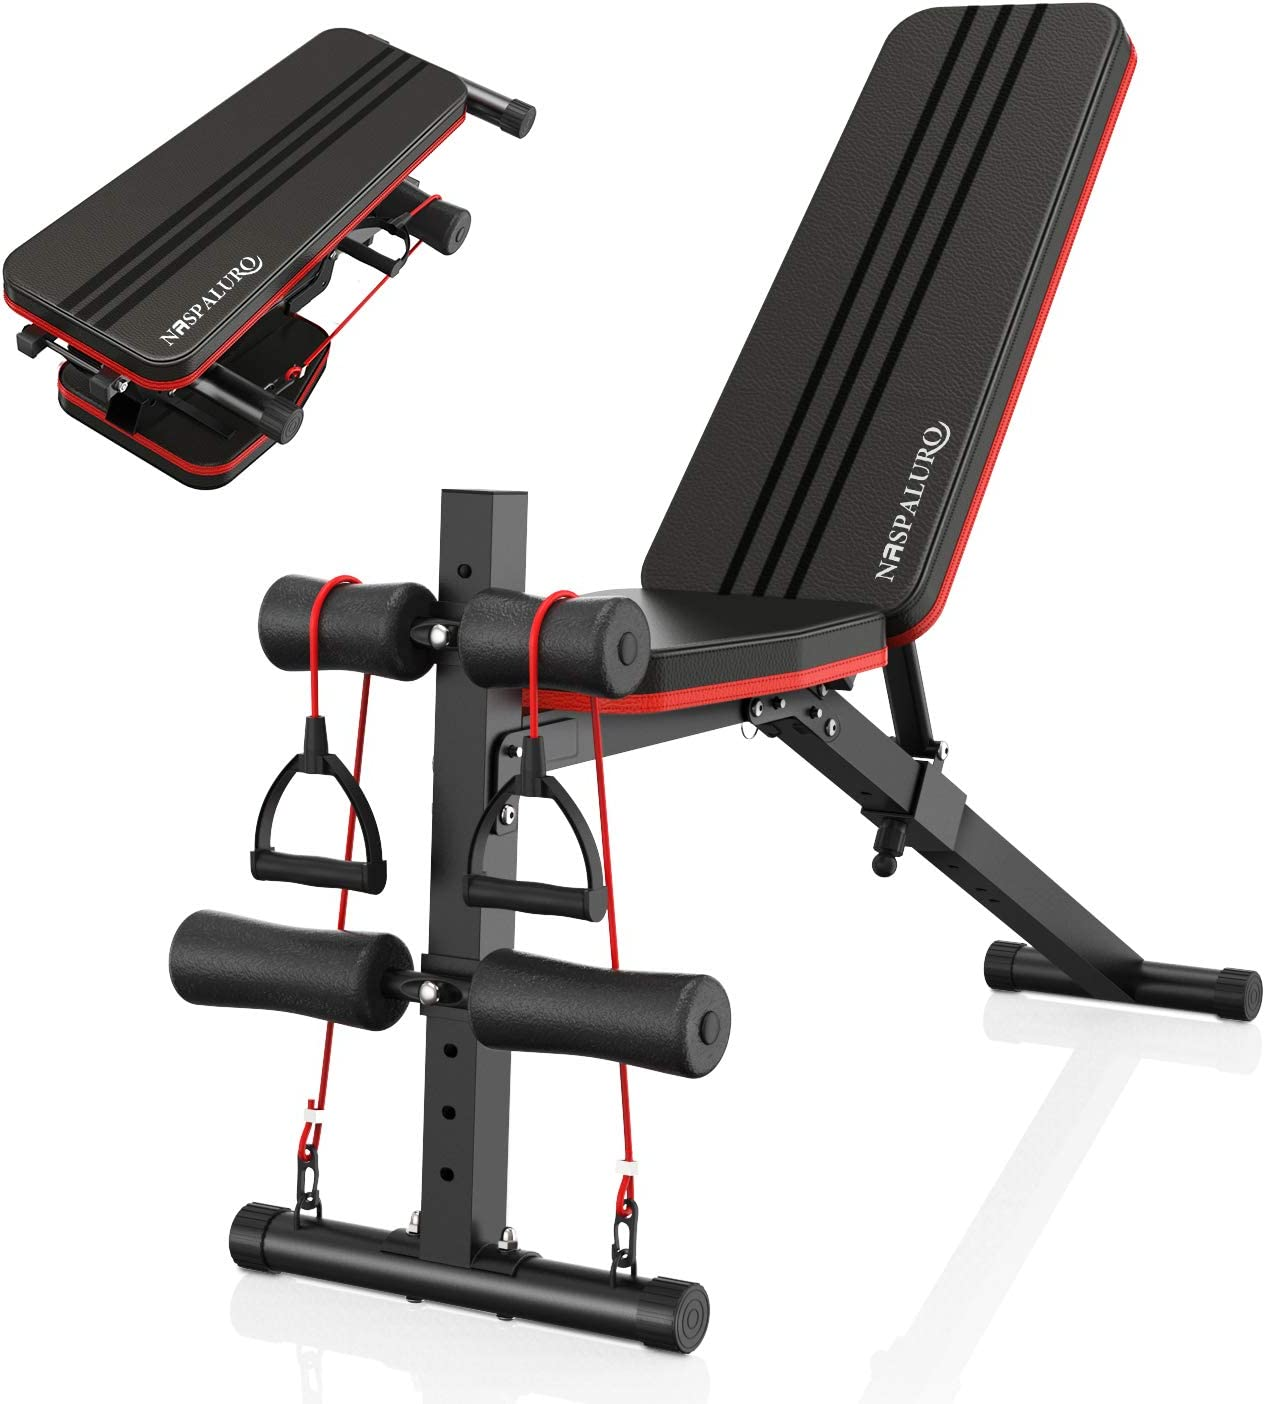 Naspaluro Adjustable Weight Bench